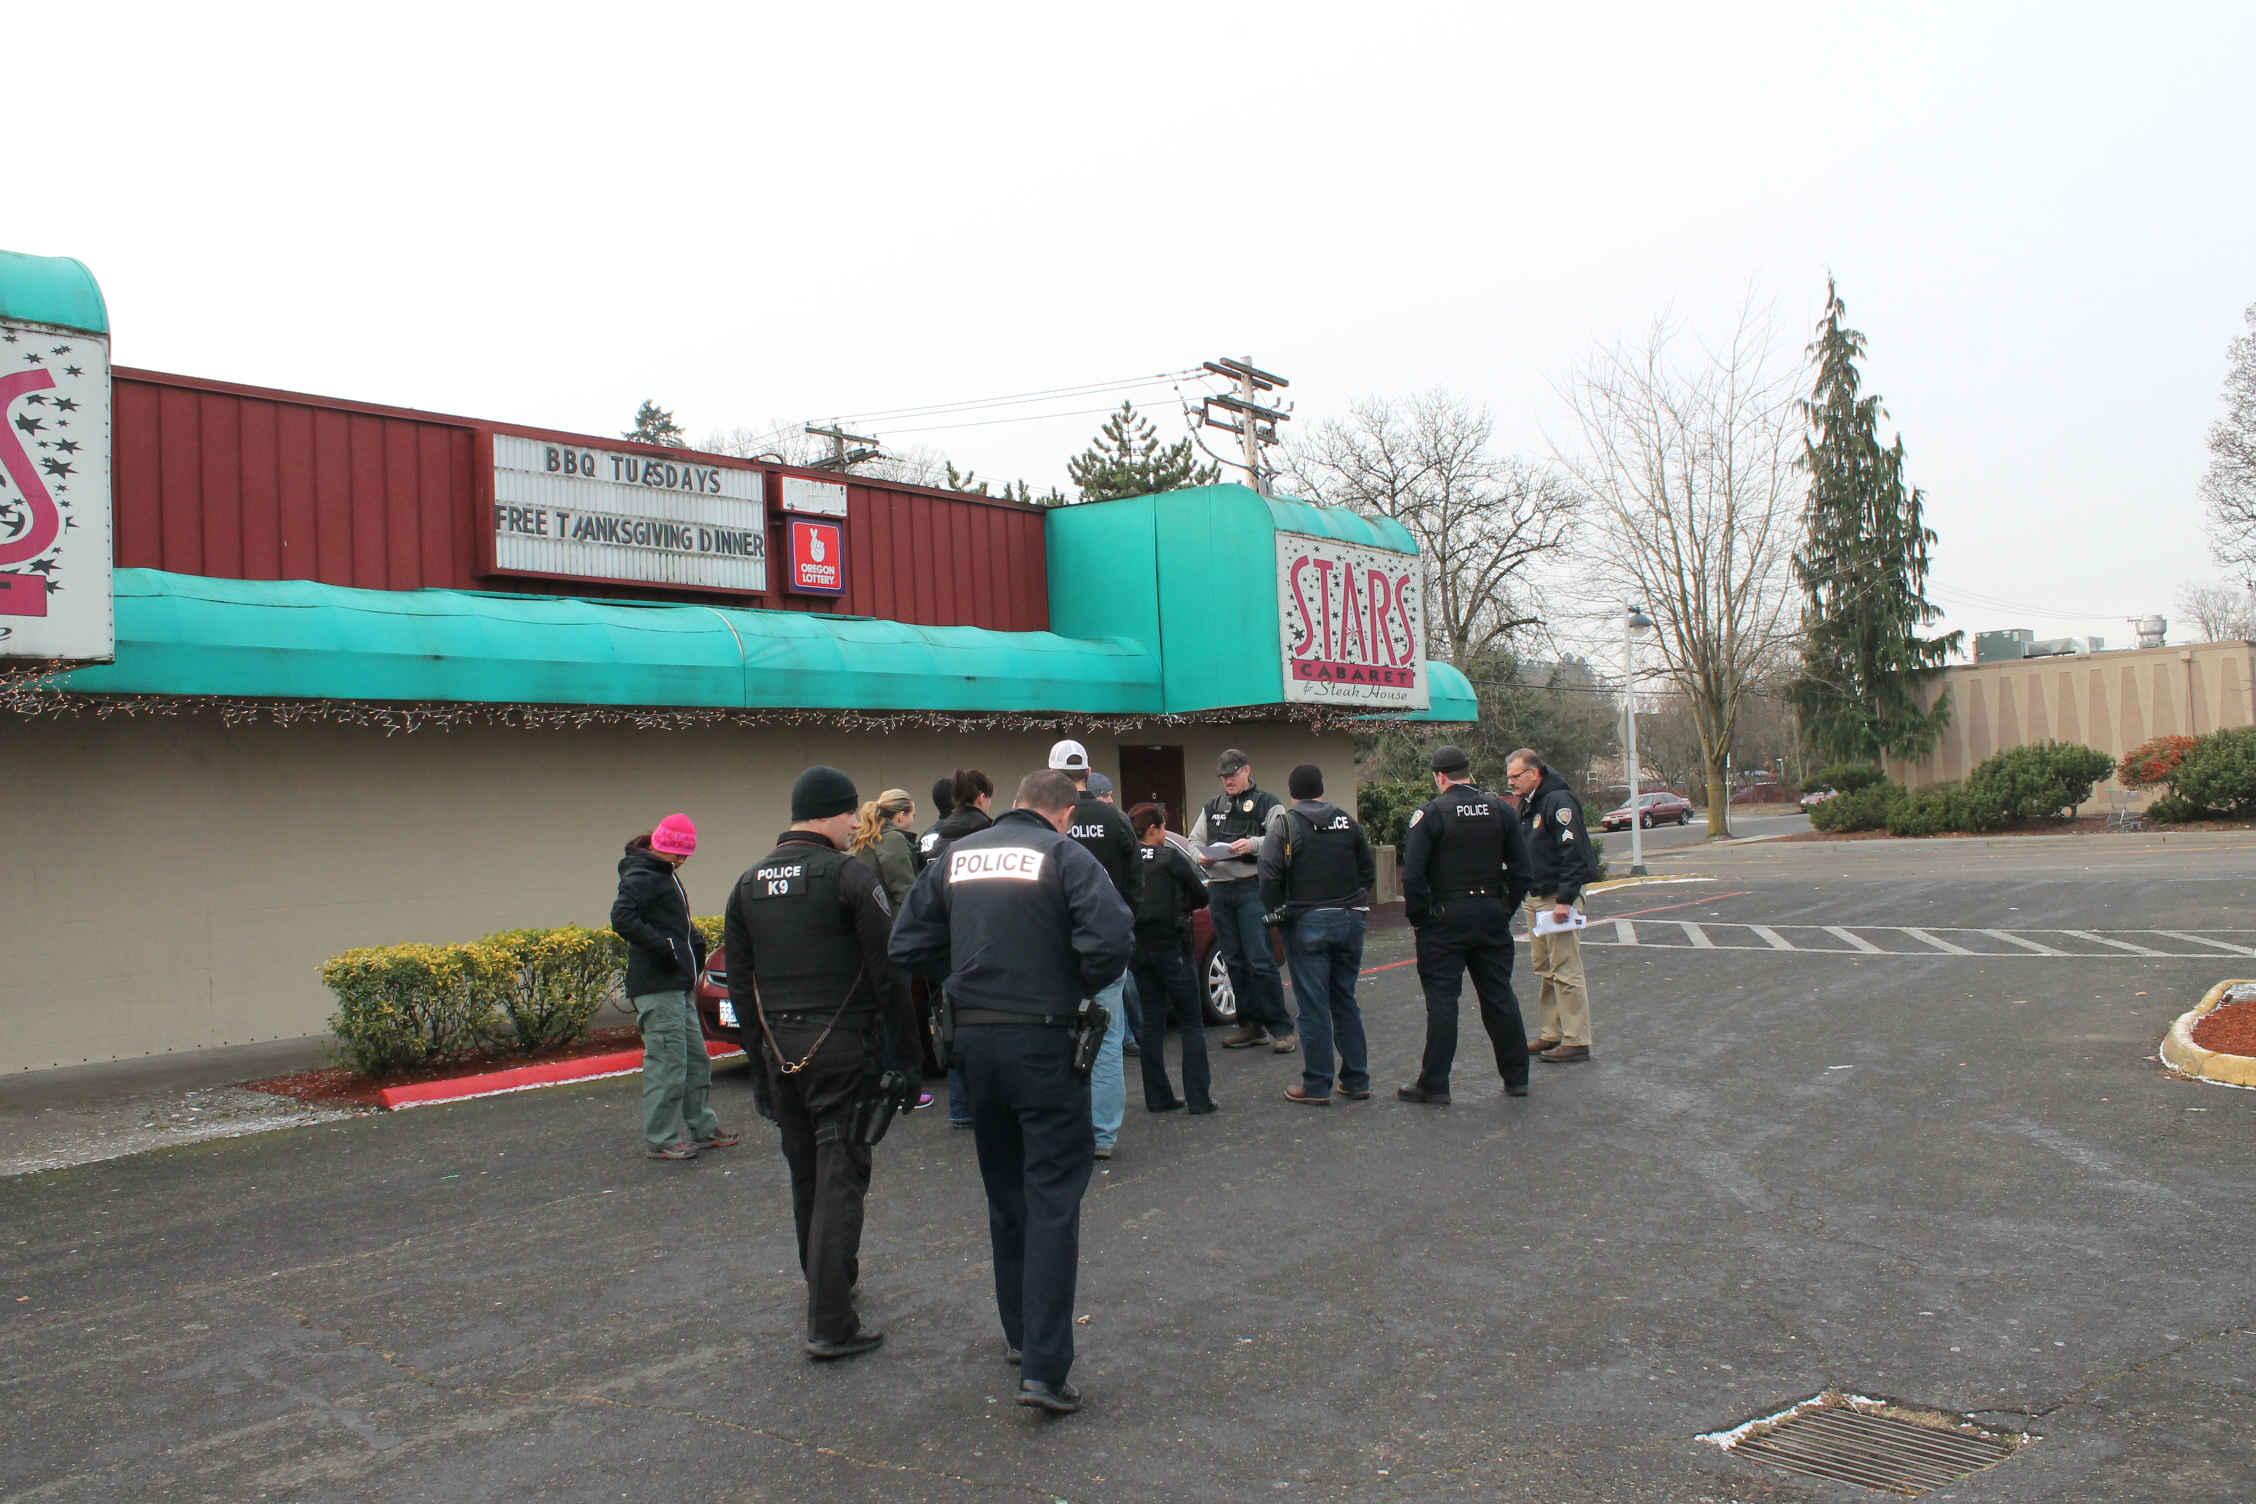 Police serving a warrant at Stars Cabaret in Beaverton in December 2013 (file image)